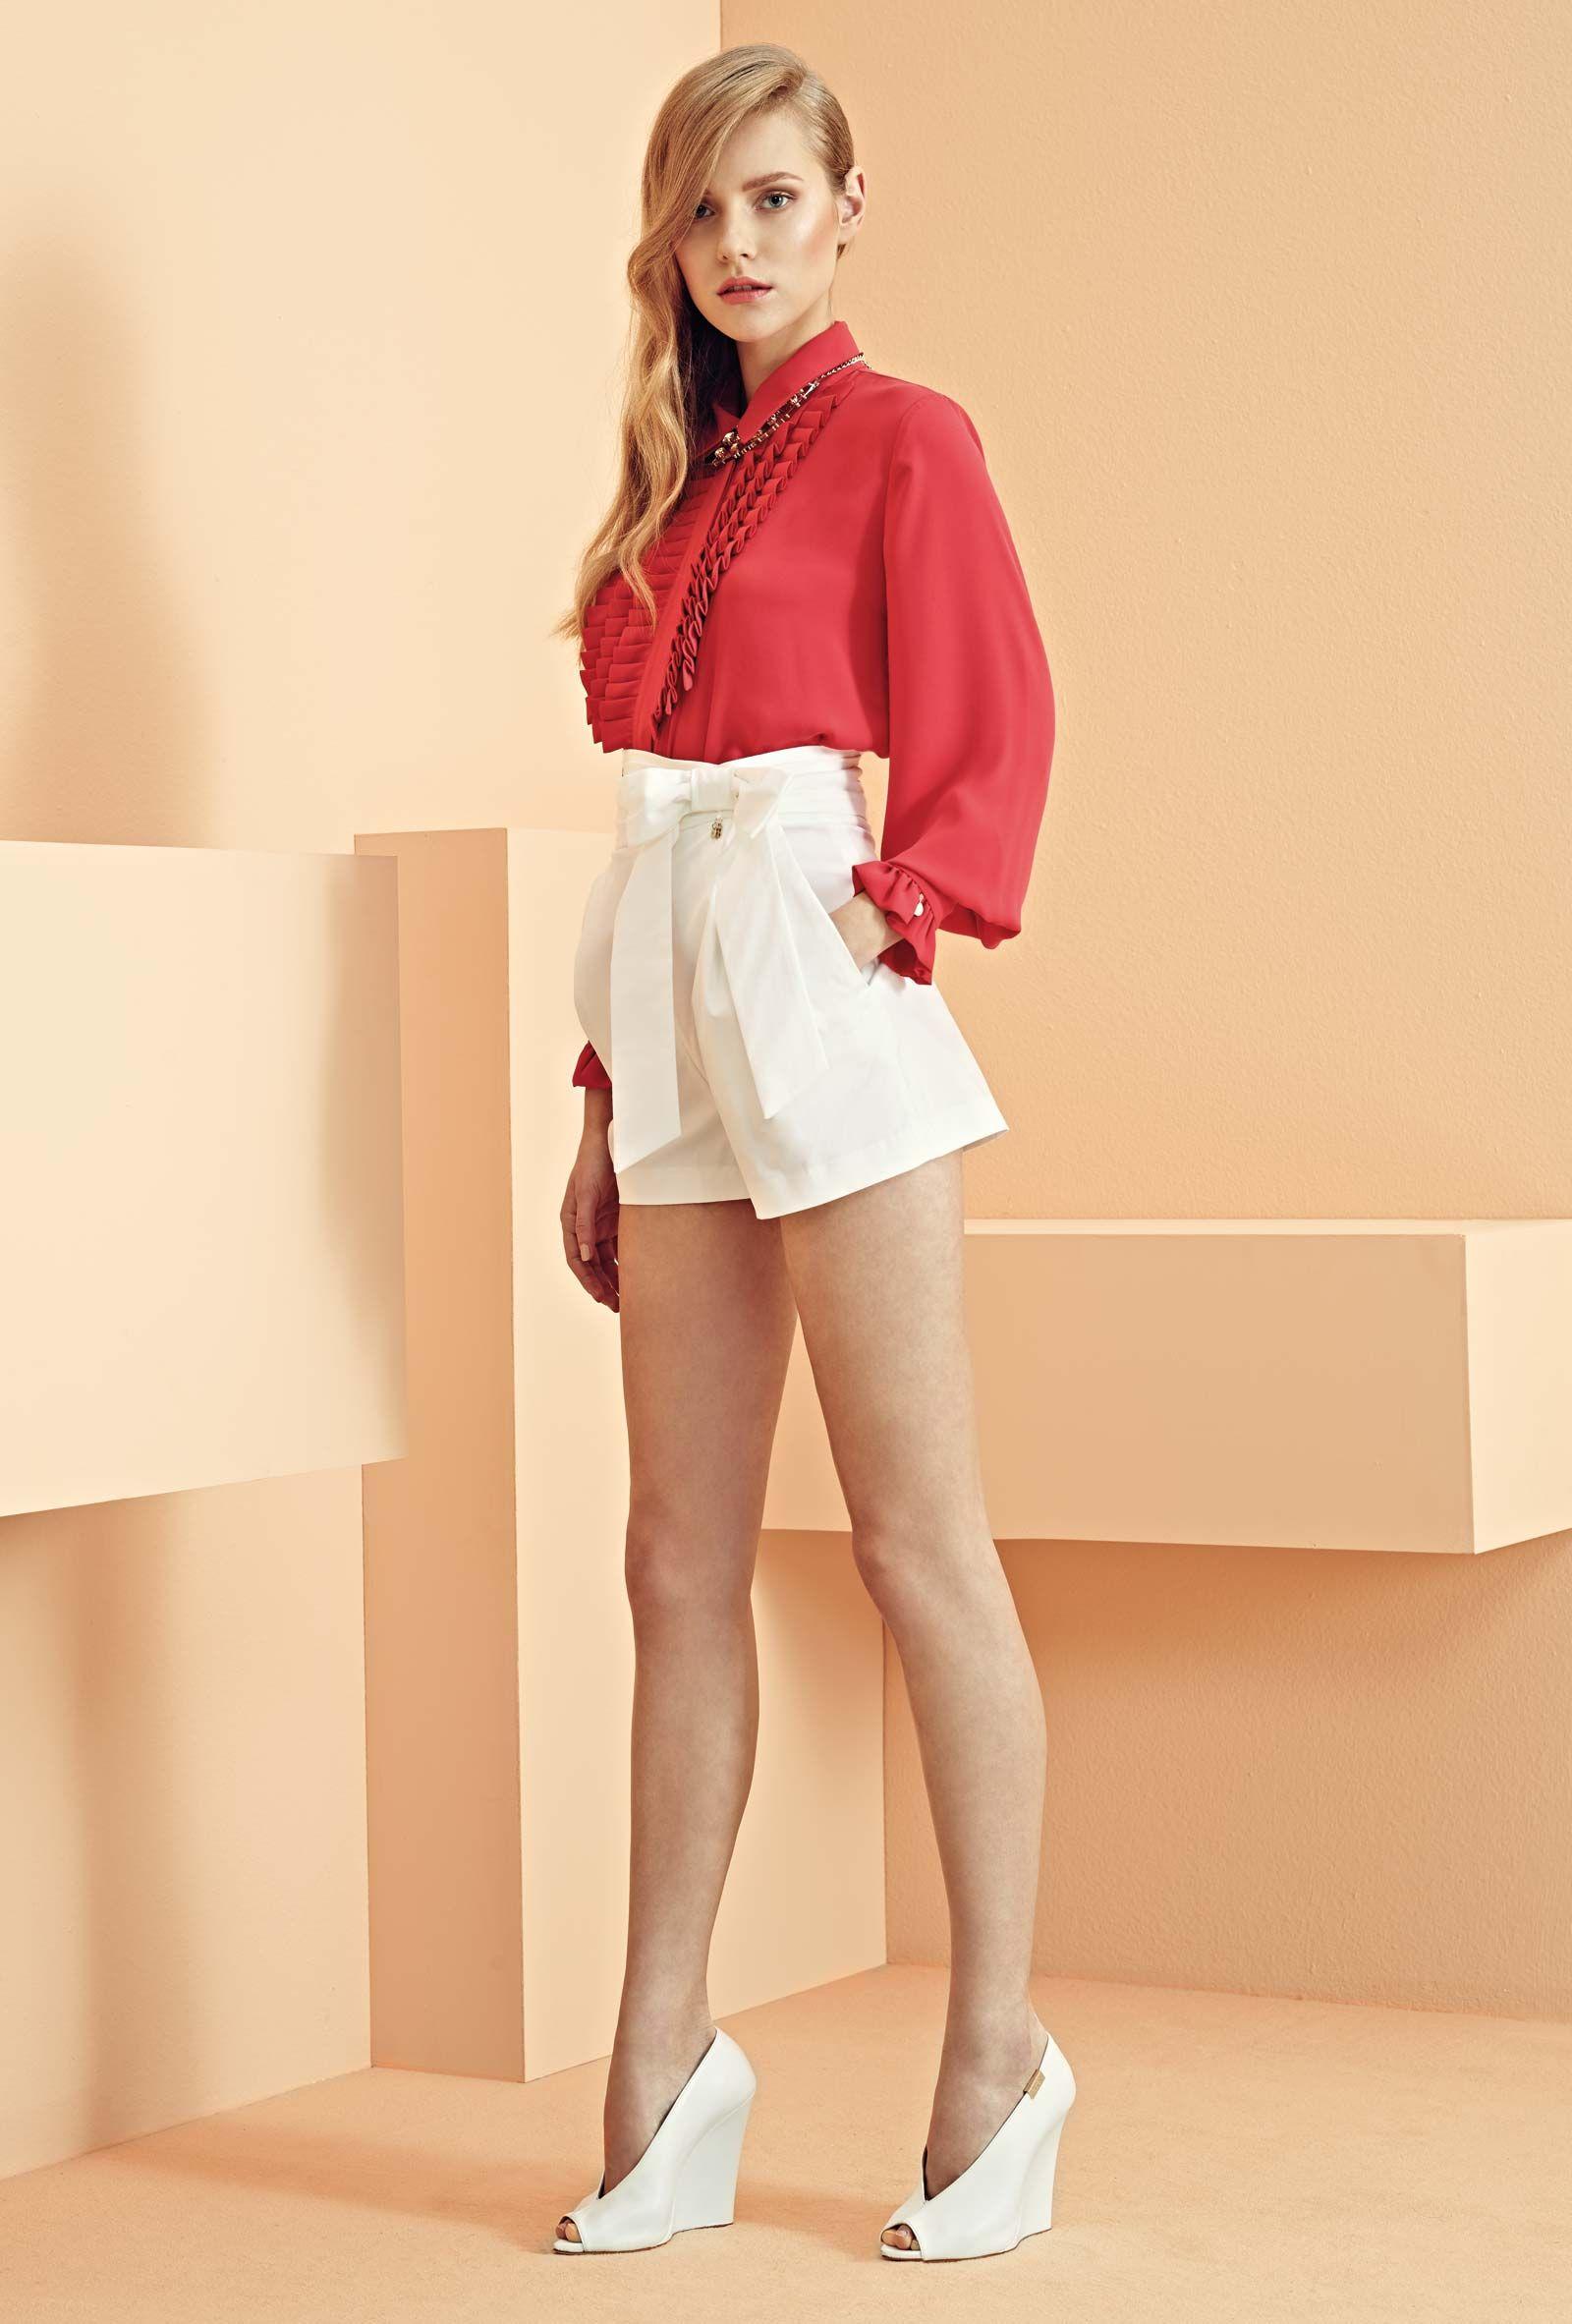 ccddee9c78 SPRING / SUMMER 2014 .. ELISABETTA FRANCHI | Fashion nel 2019 ...